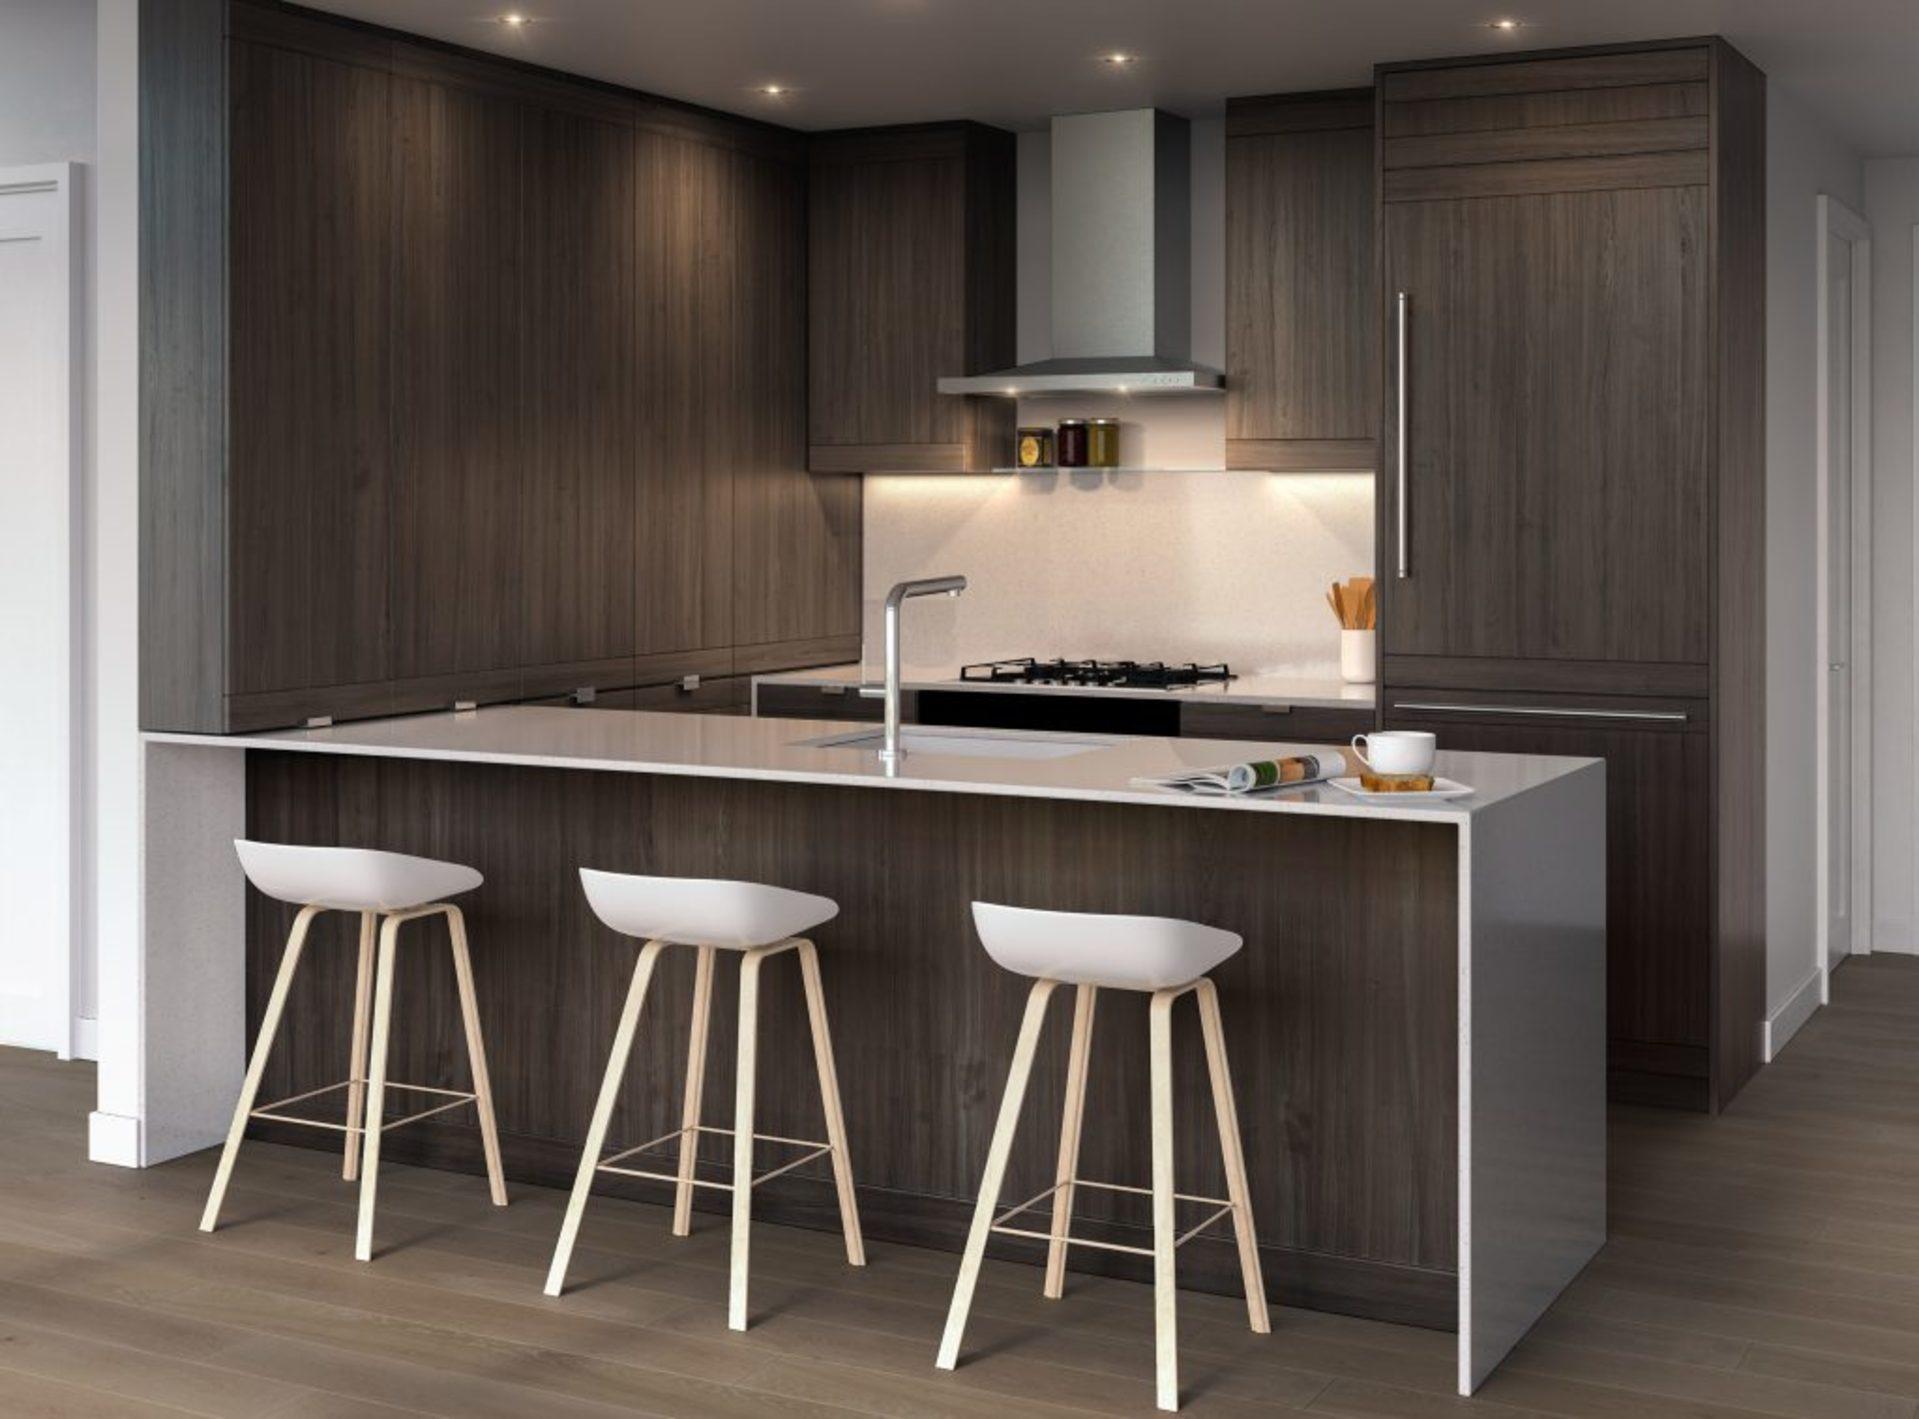 lumina-cabinetry-2 at Waterfall  -  Lumina (2425 Beta Avenue, Brentwood Park, Burnaby North)